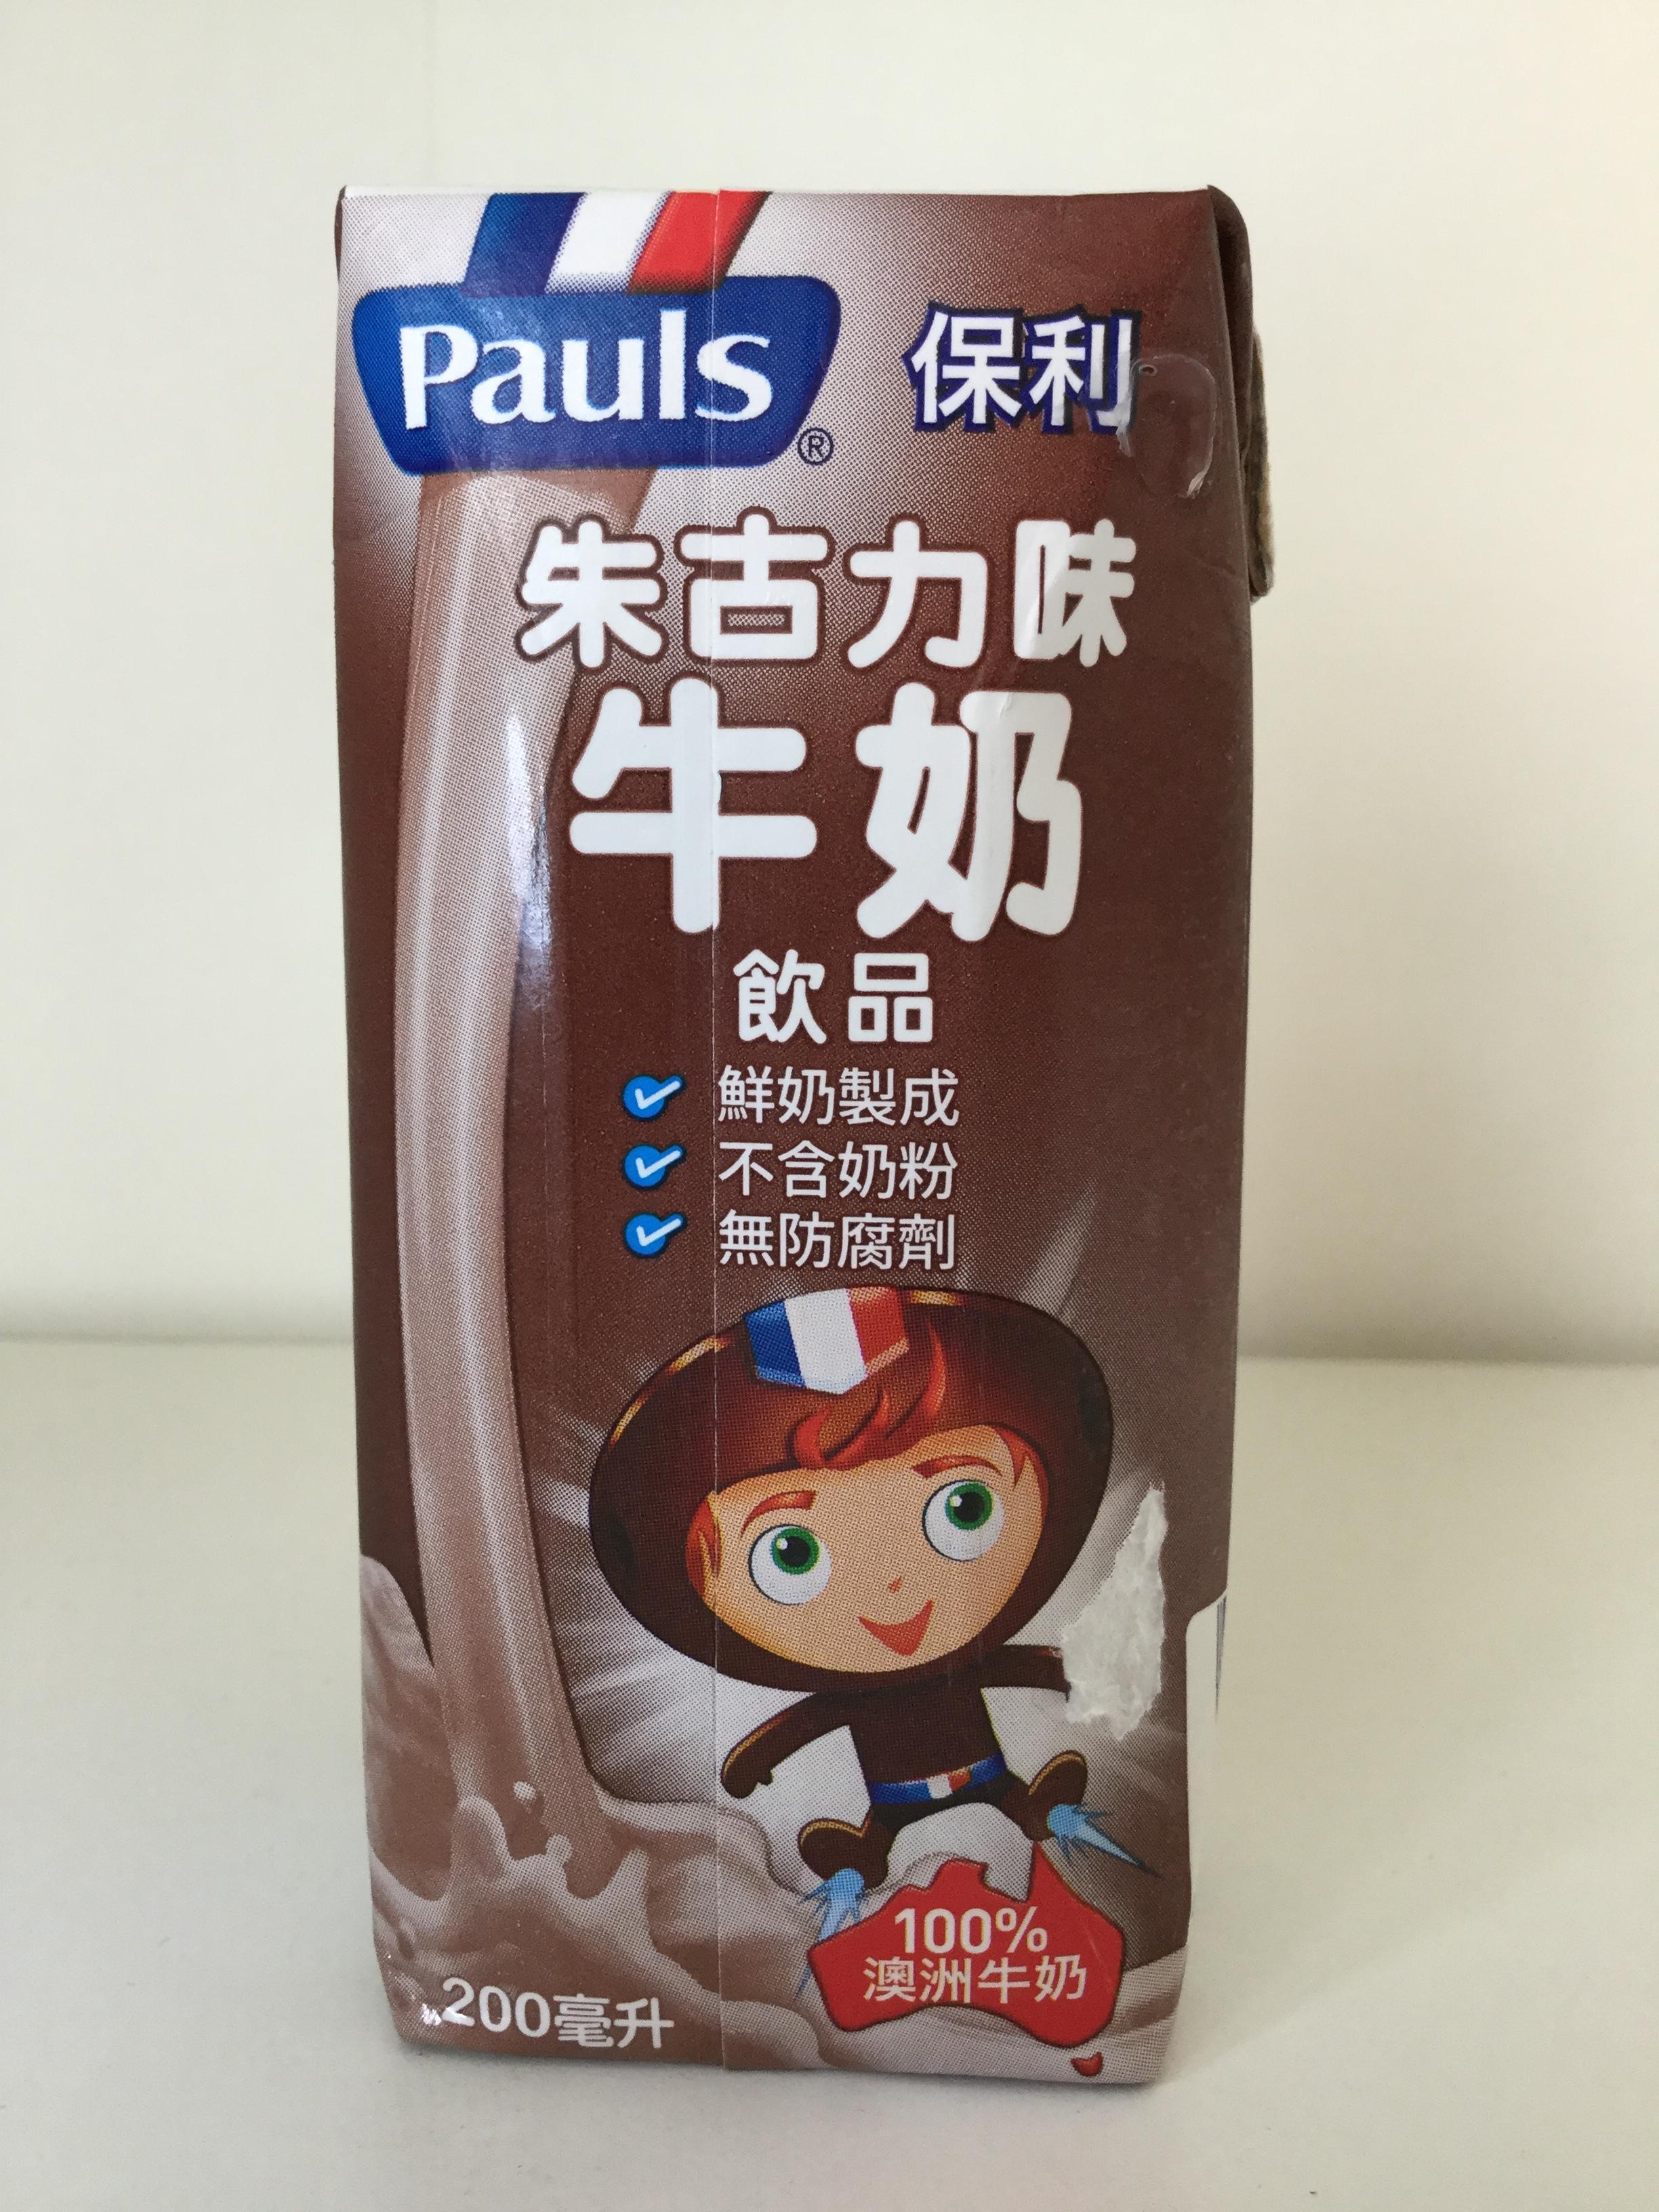 Pauls Chocolate Milk Side 3